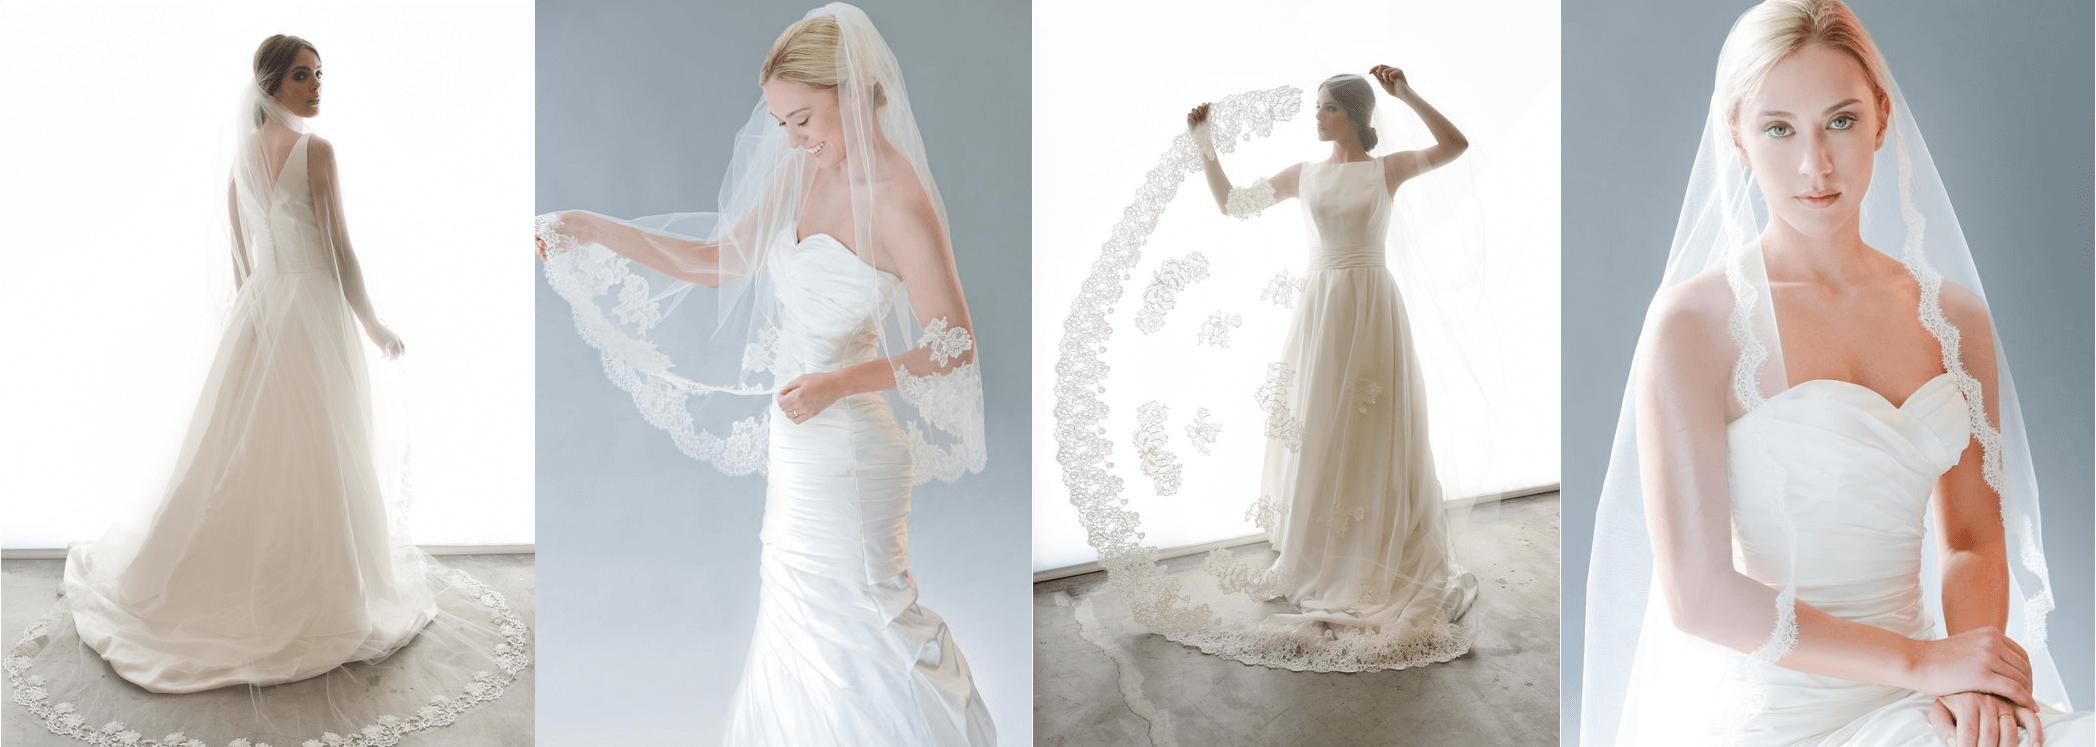 Washington dc bridal stores washington dc bridesmaid dresses m erica koesler accessories ombrellifo Choice Image